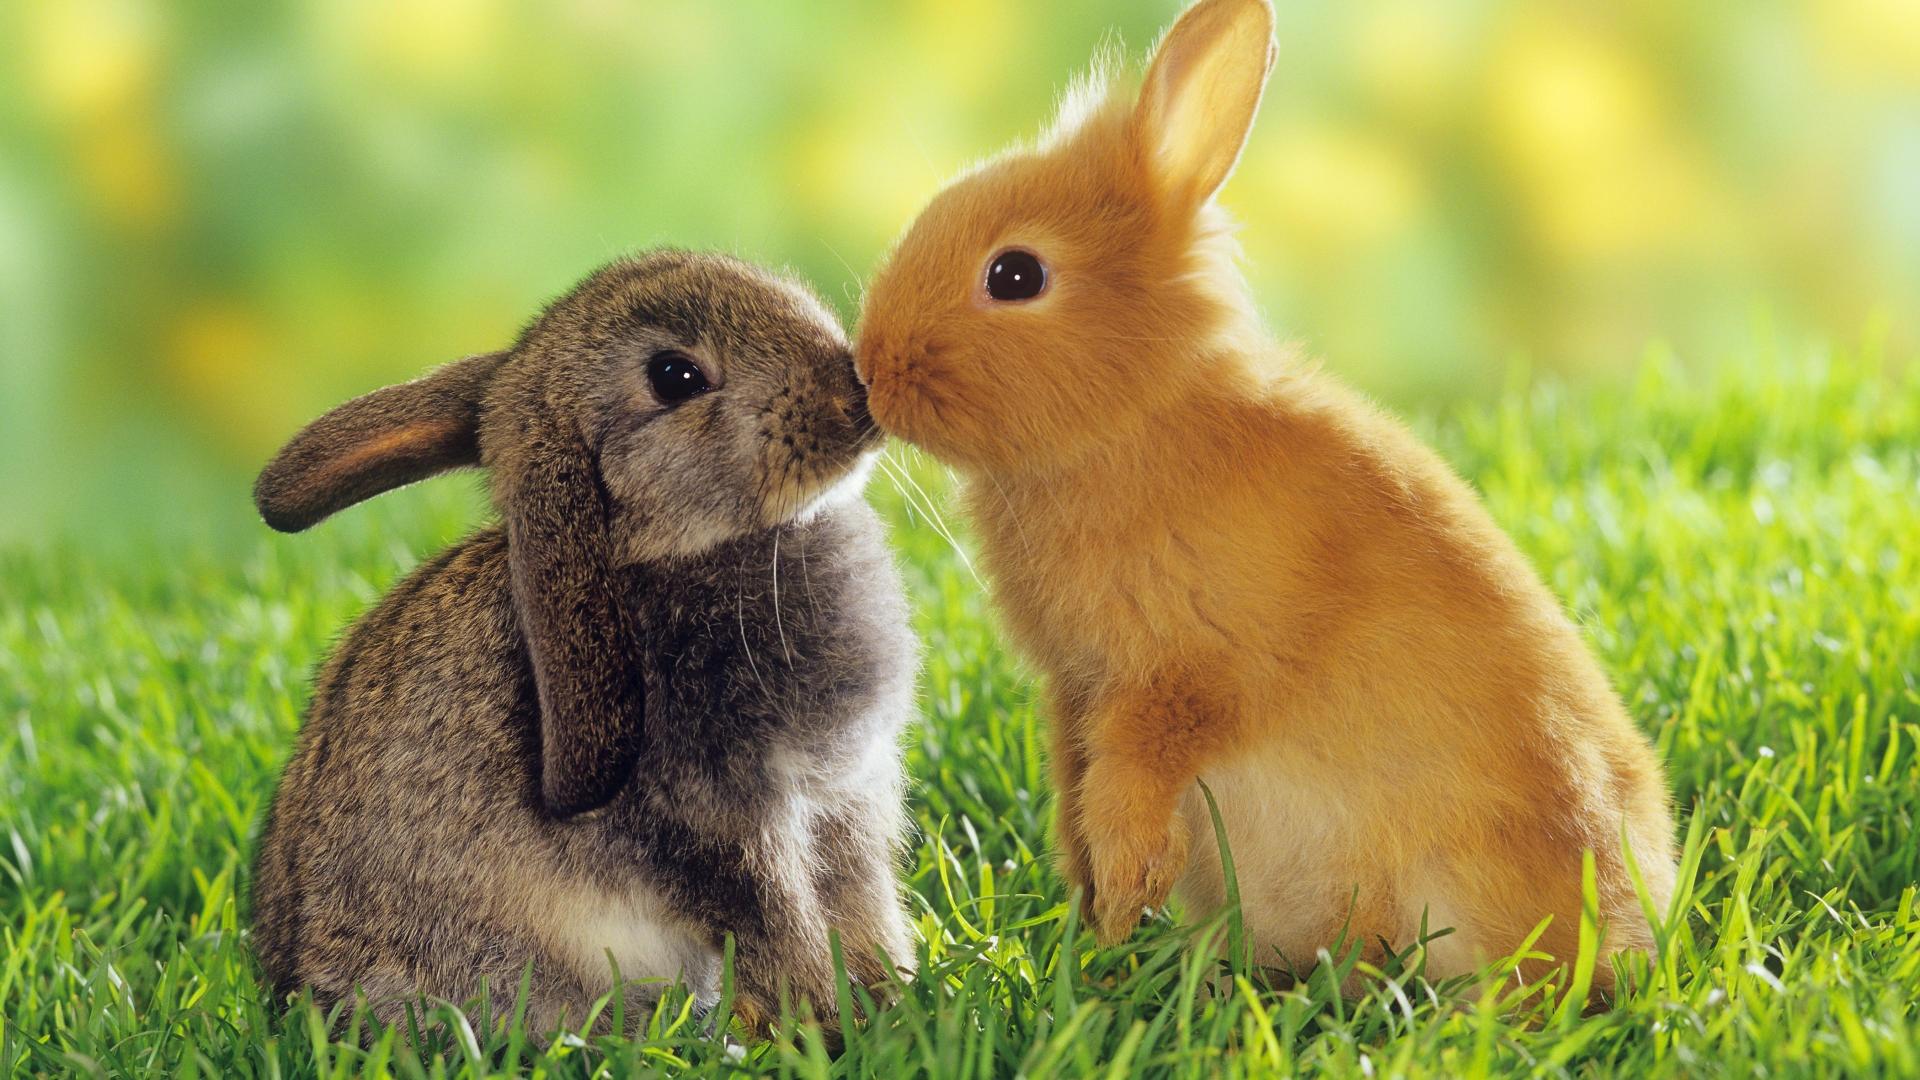 ... cute-animal-hd-wallpapers ...